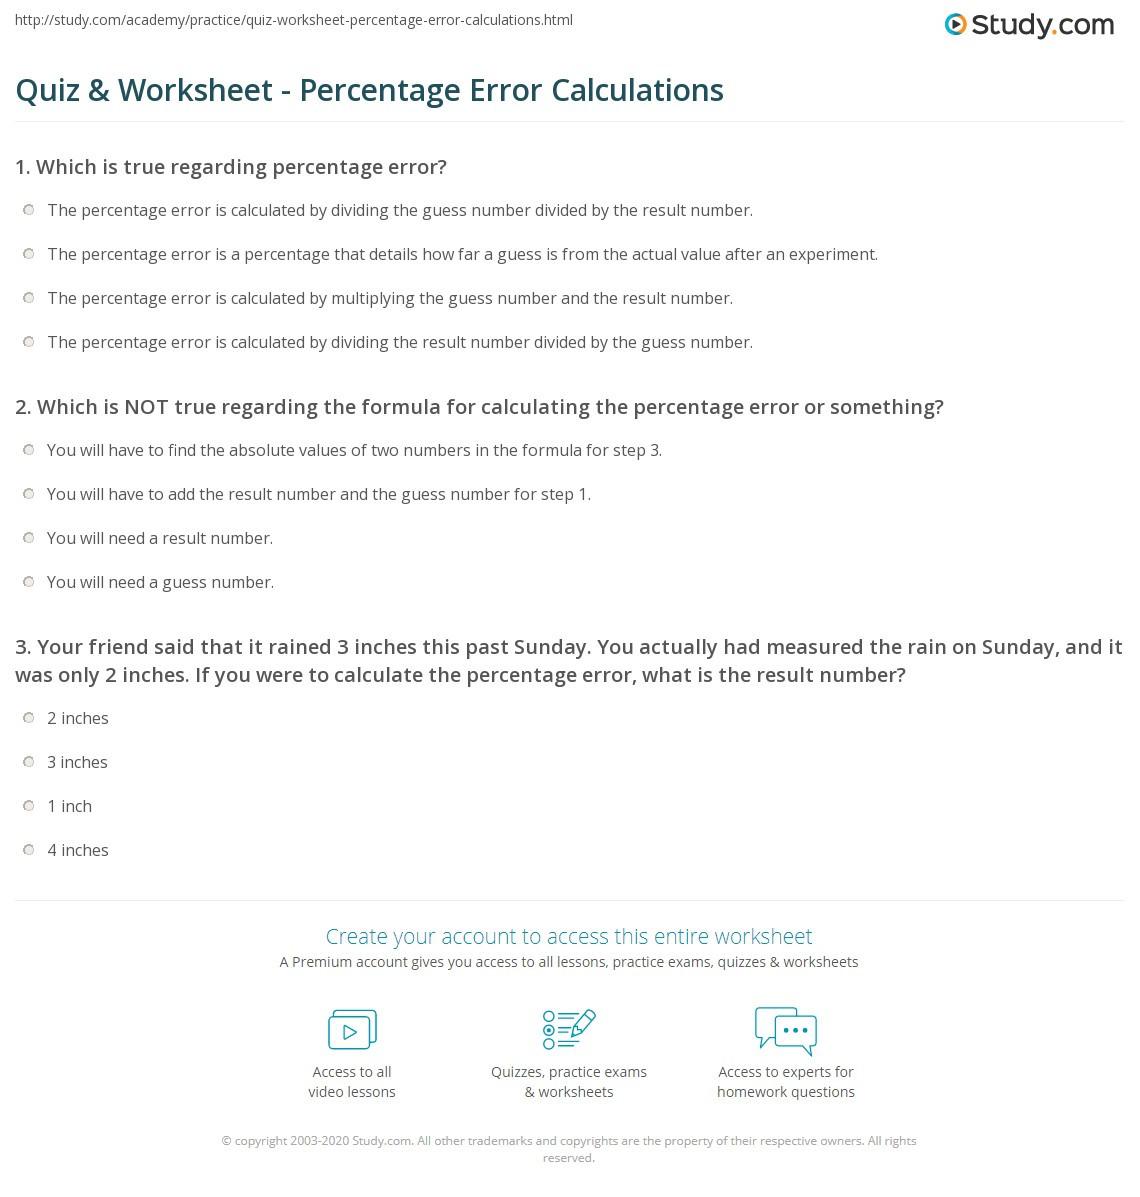 30 Percent Error Worksheet Answers